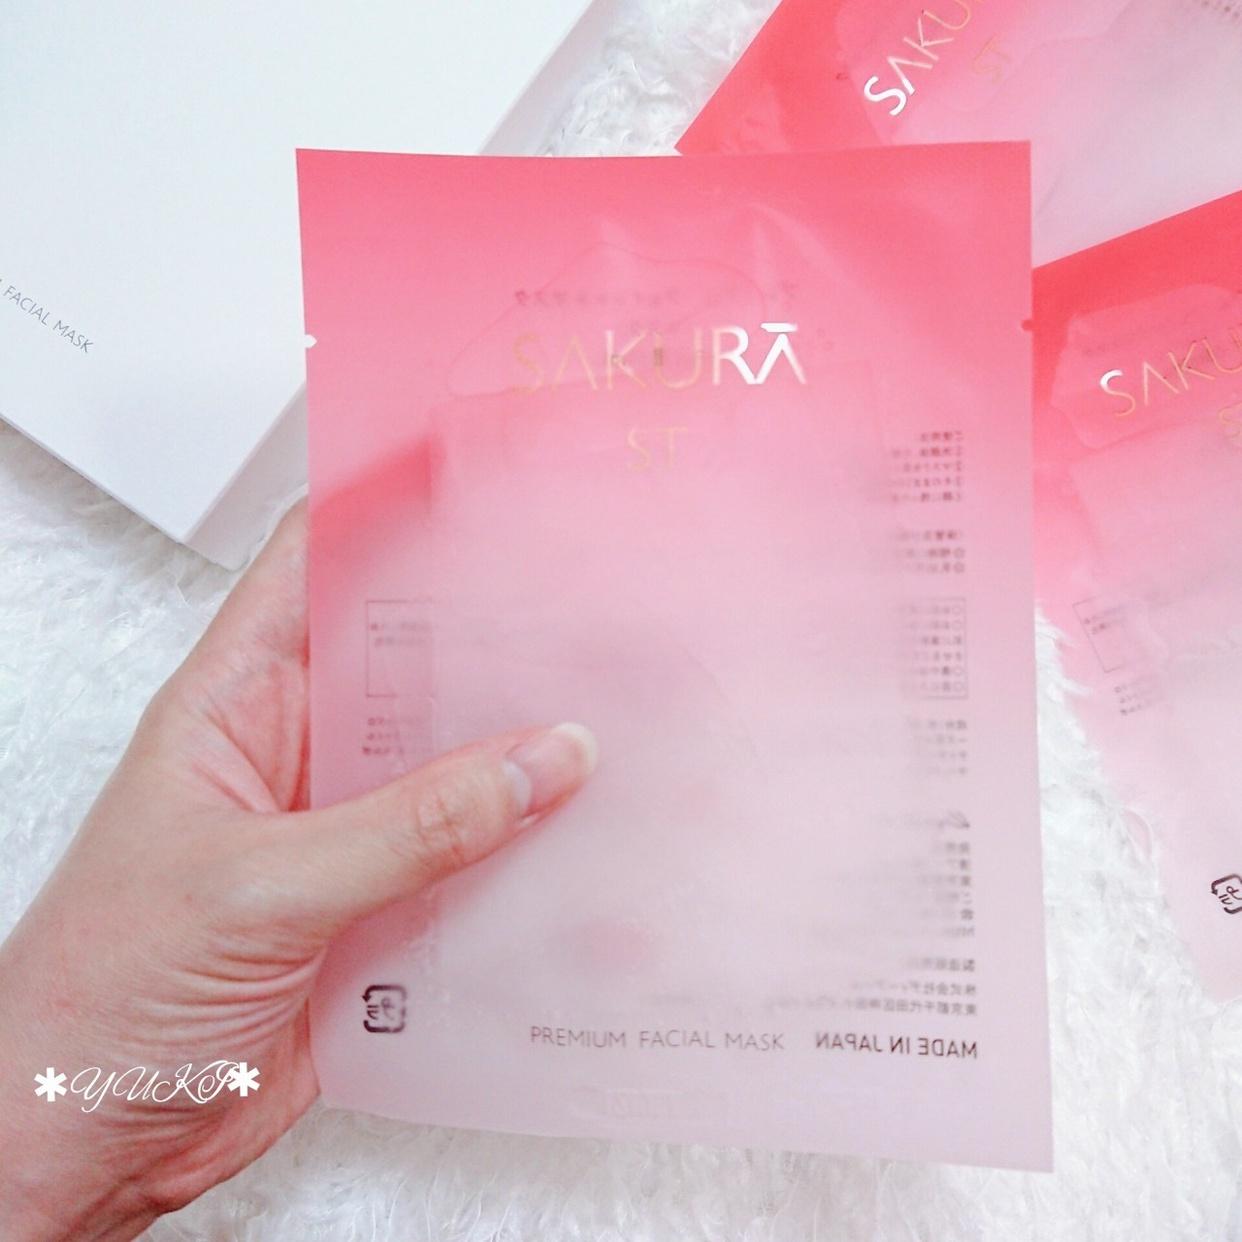 SAKURA ST(サクラ エスティ) プレミアム フェイシャル マスクを使ったYUKIさんのクチコミ画像3